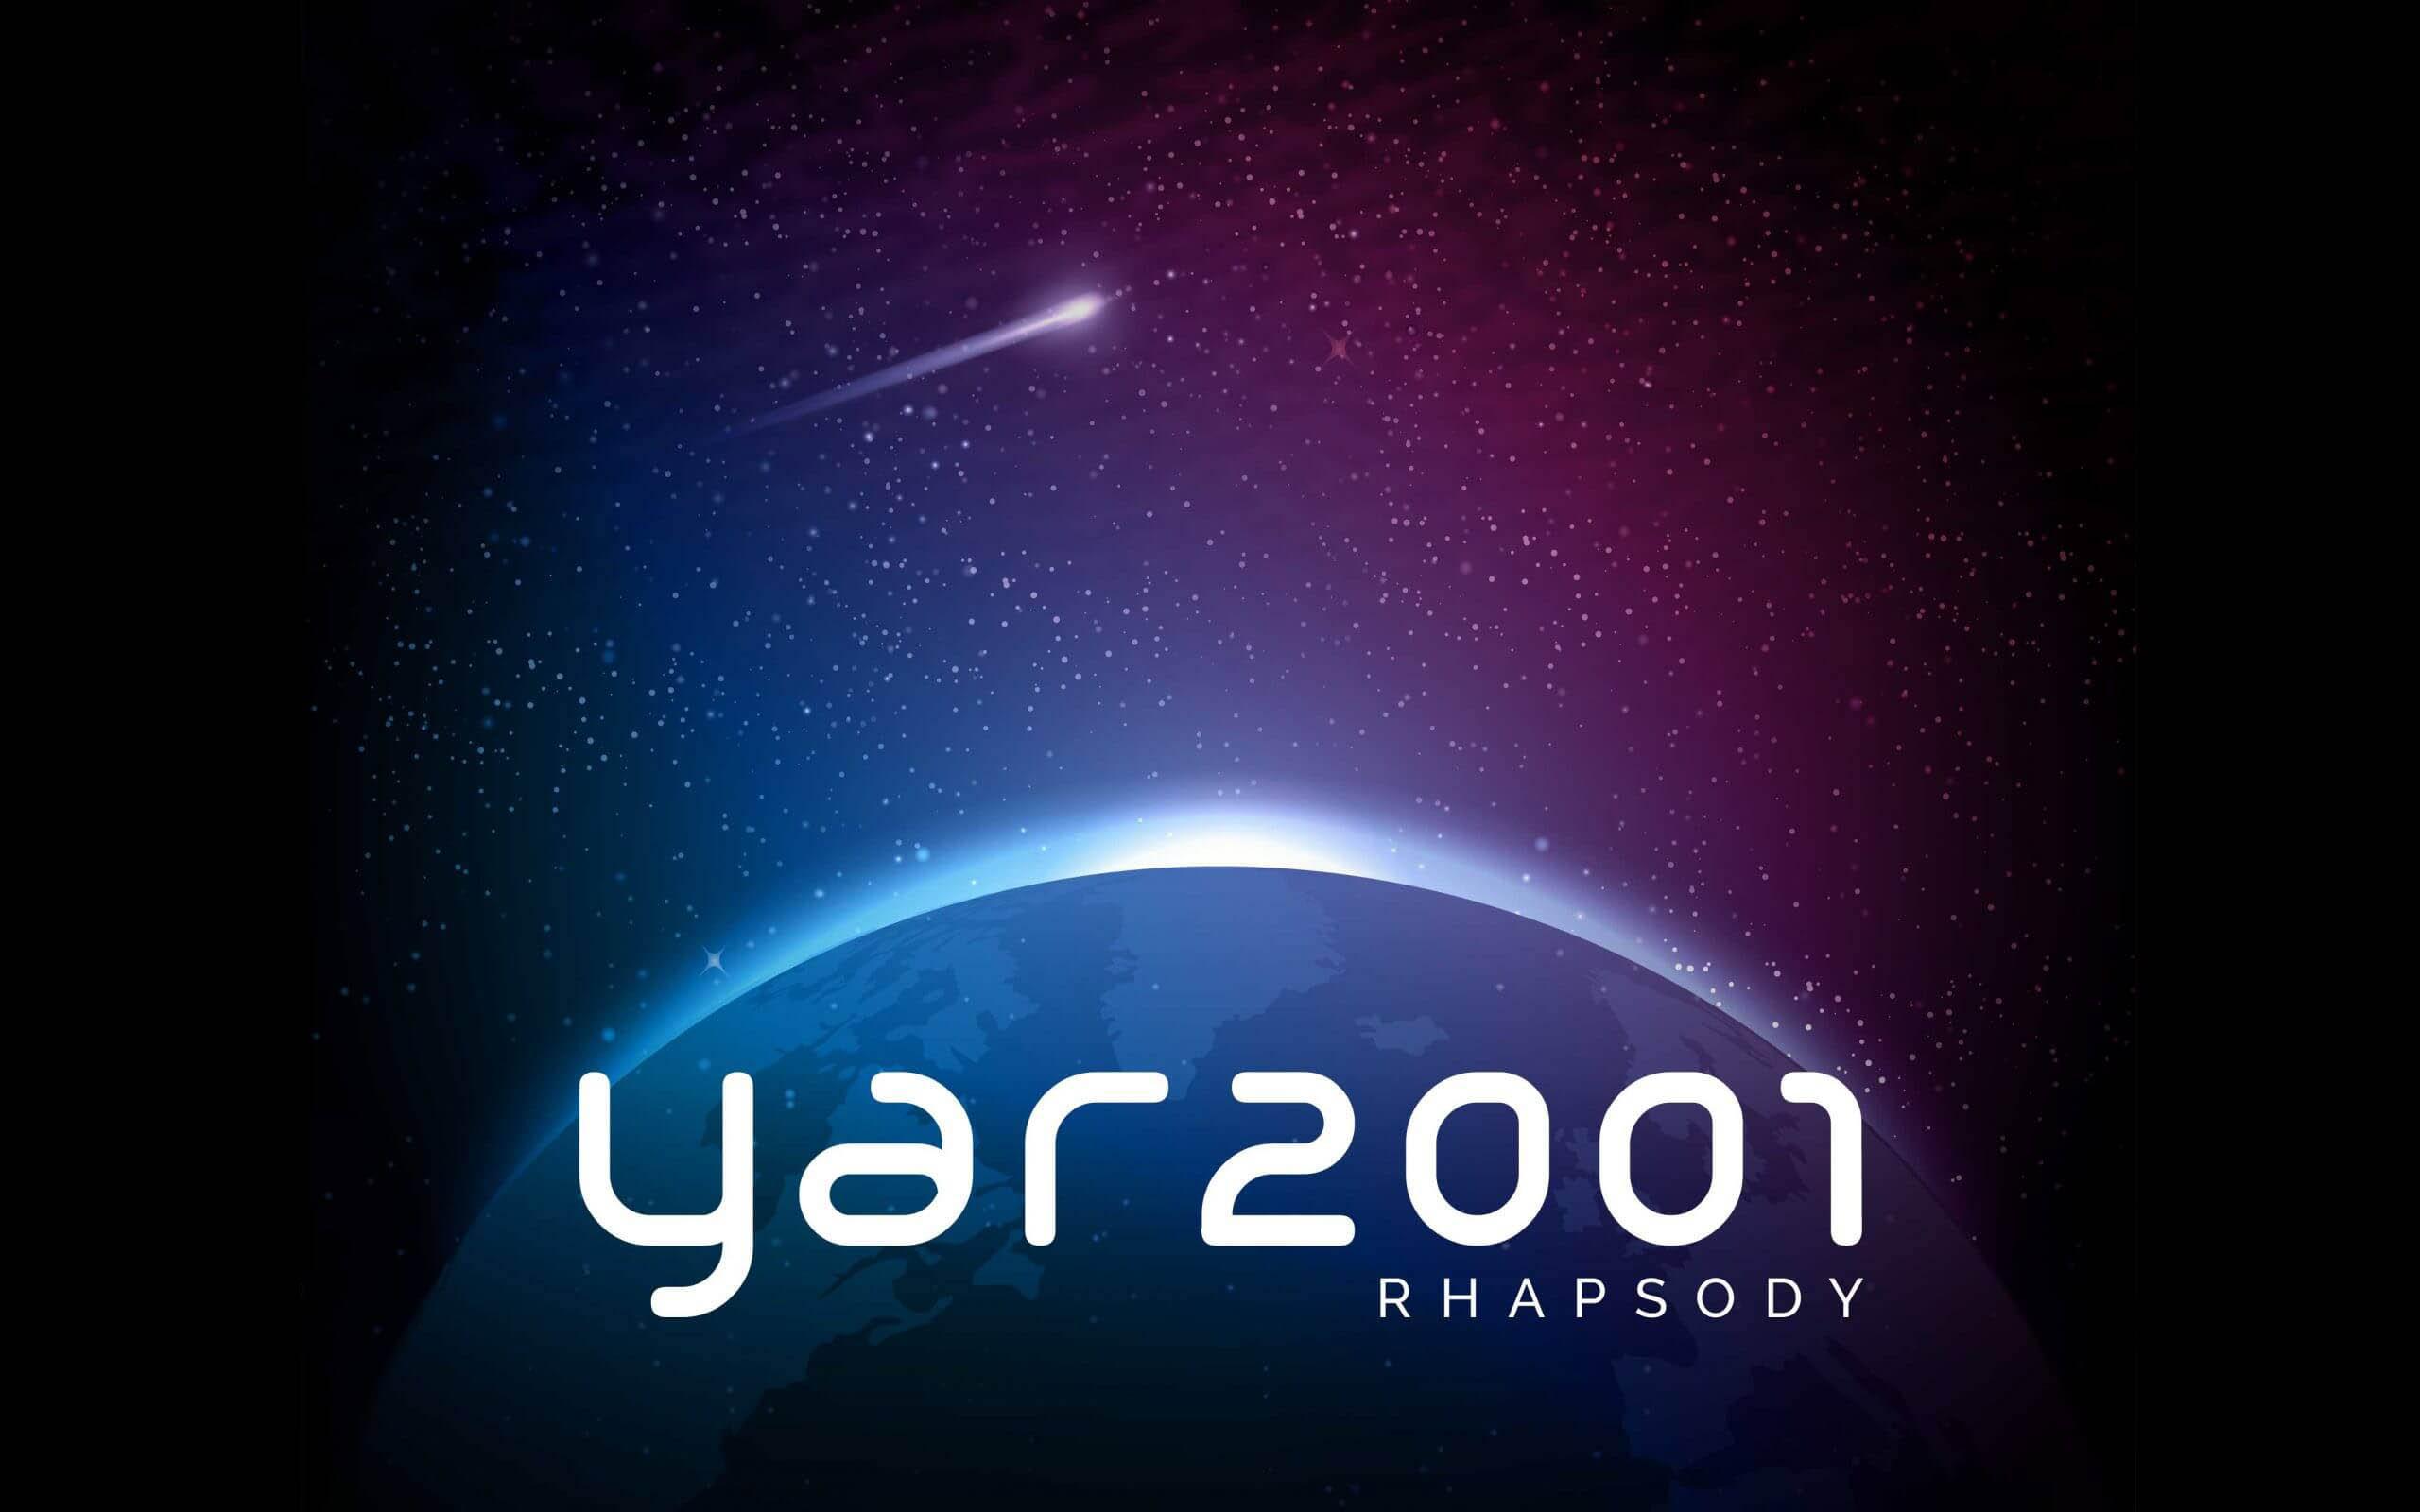 你好,我是yar2001